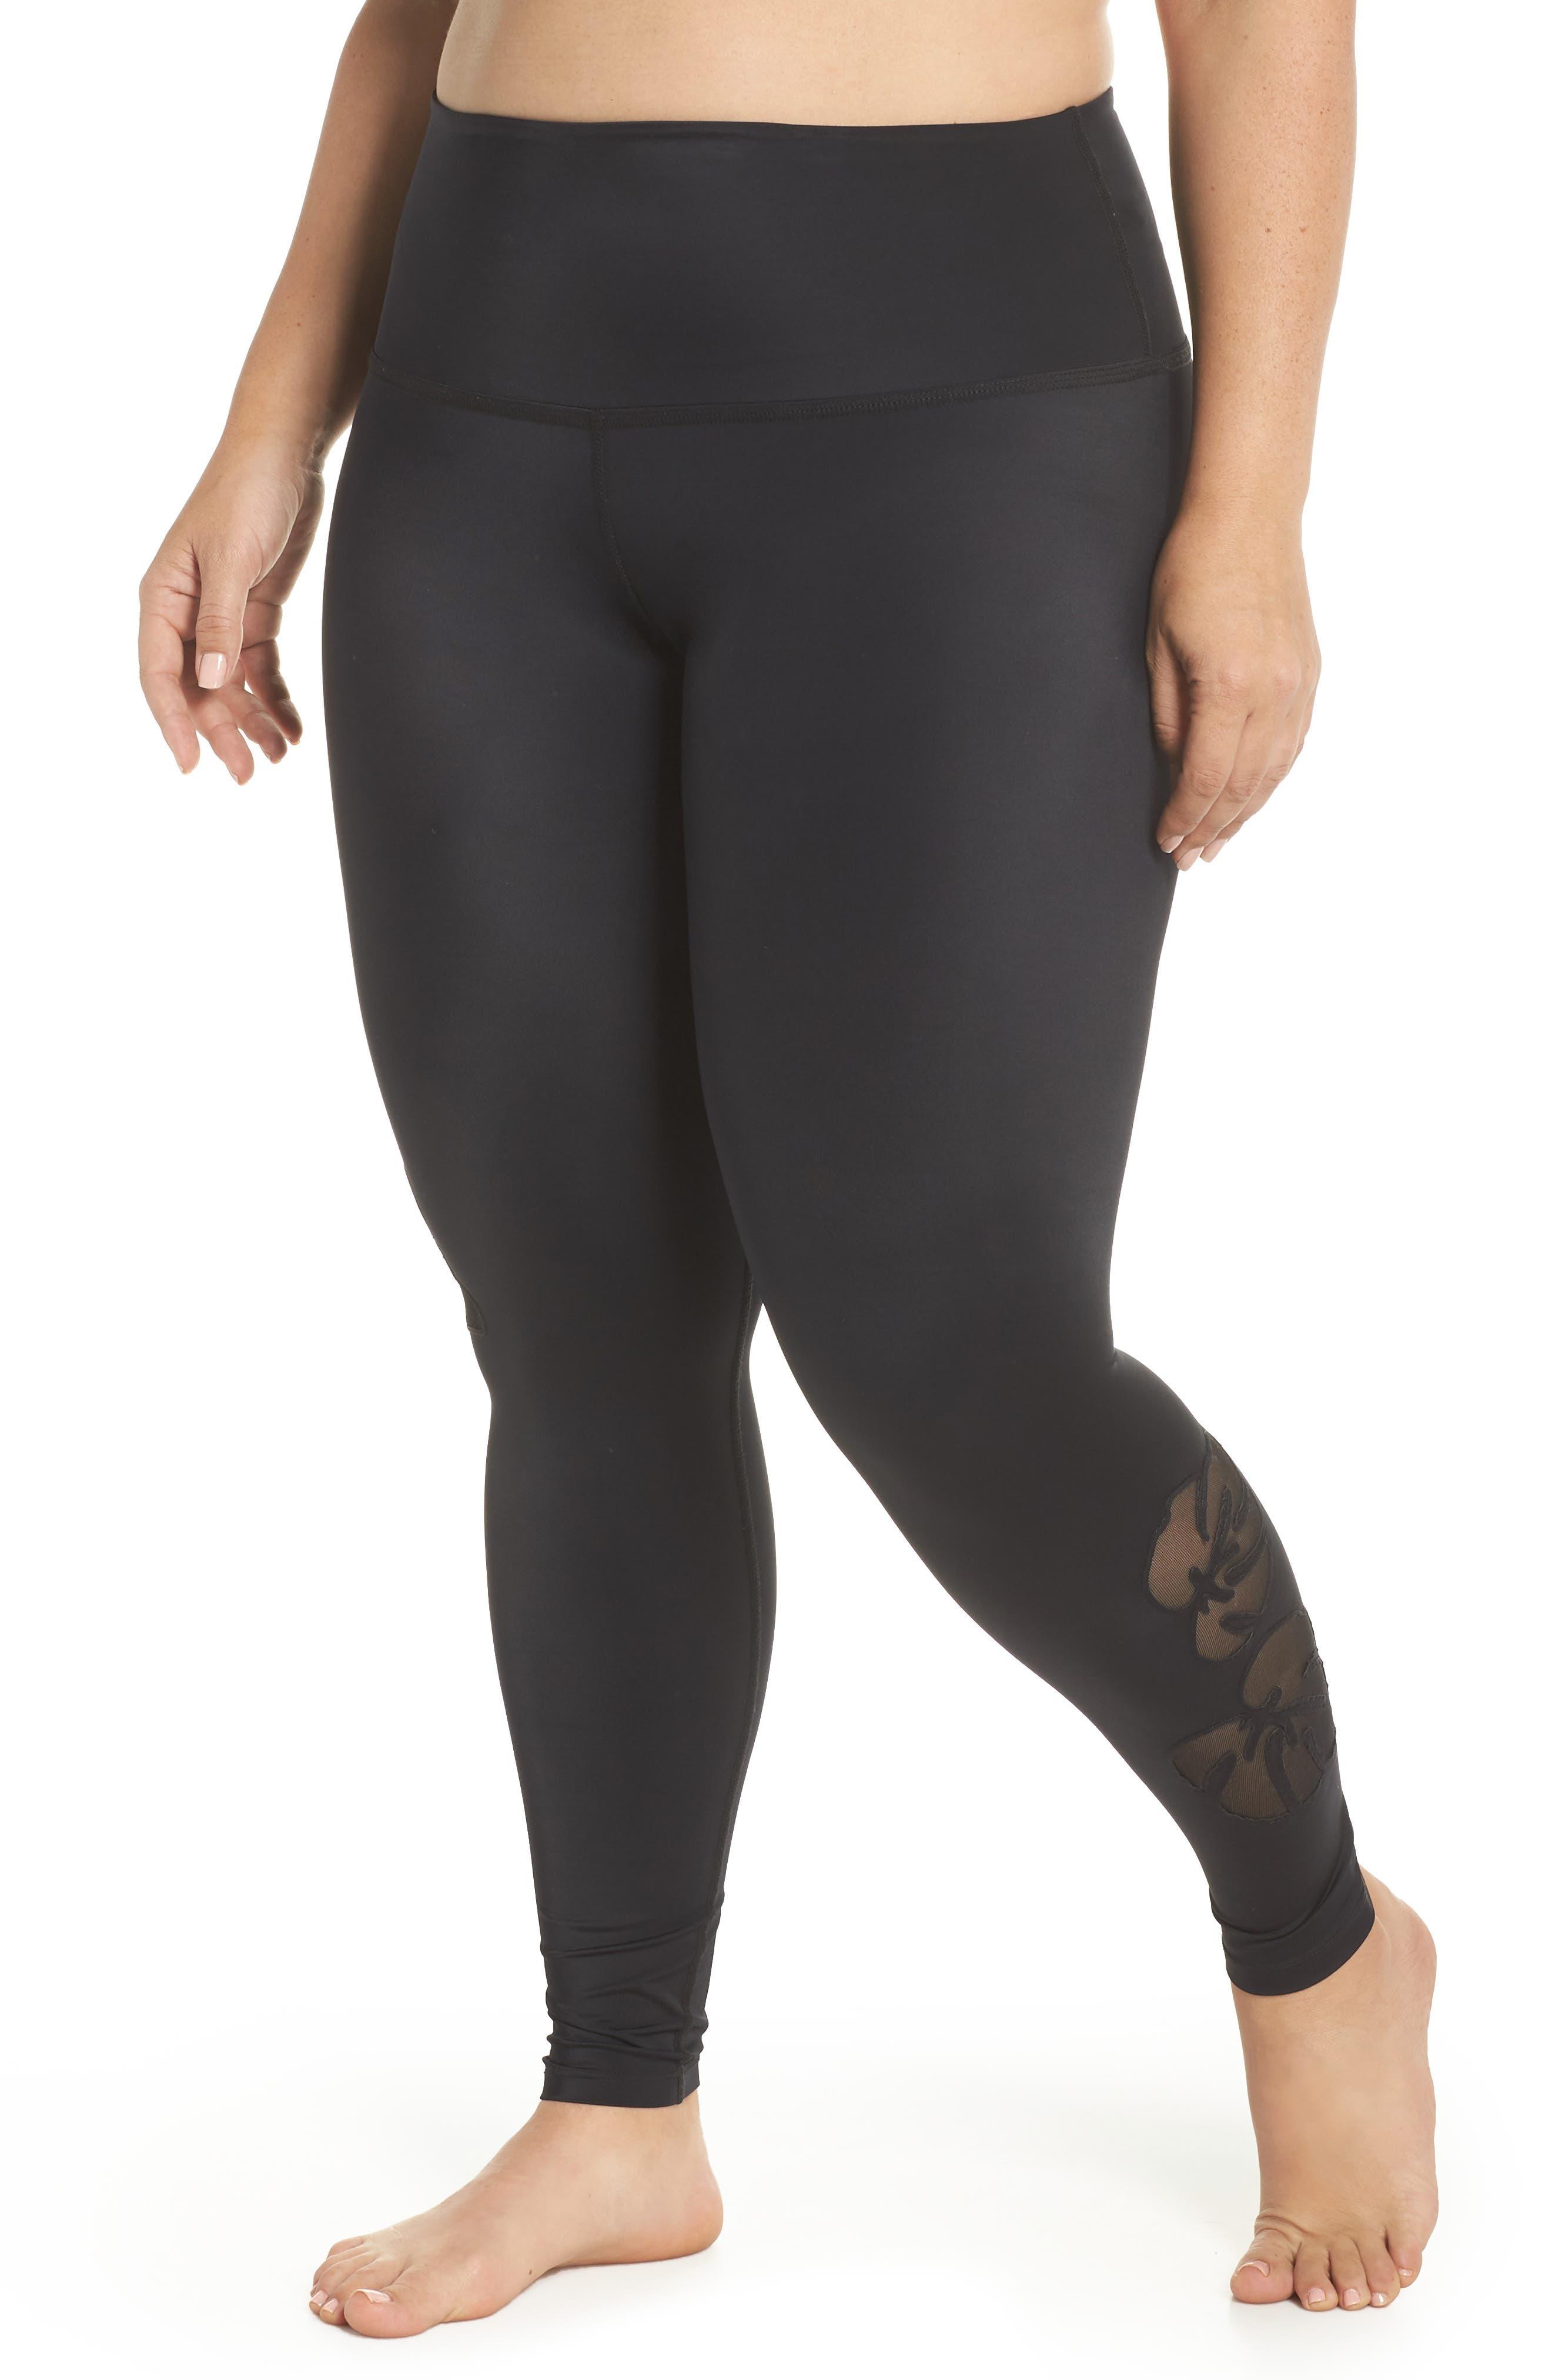 Take Leaf High Waist Leggings,                         Main,                         color, Black